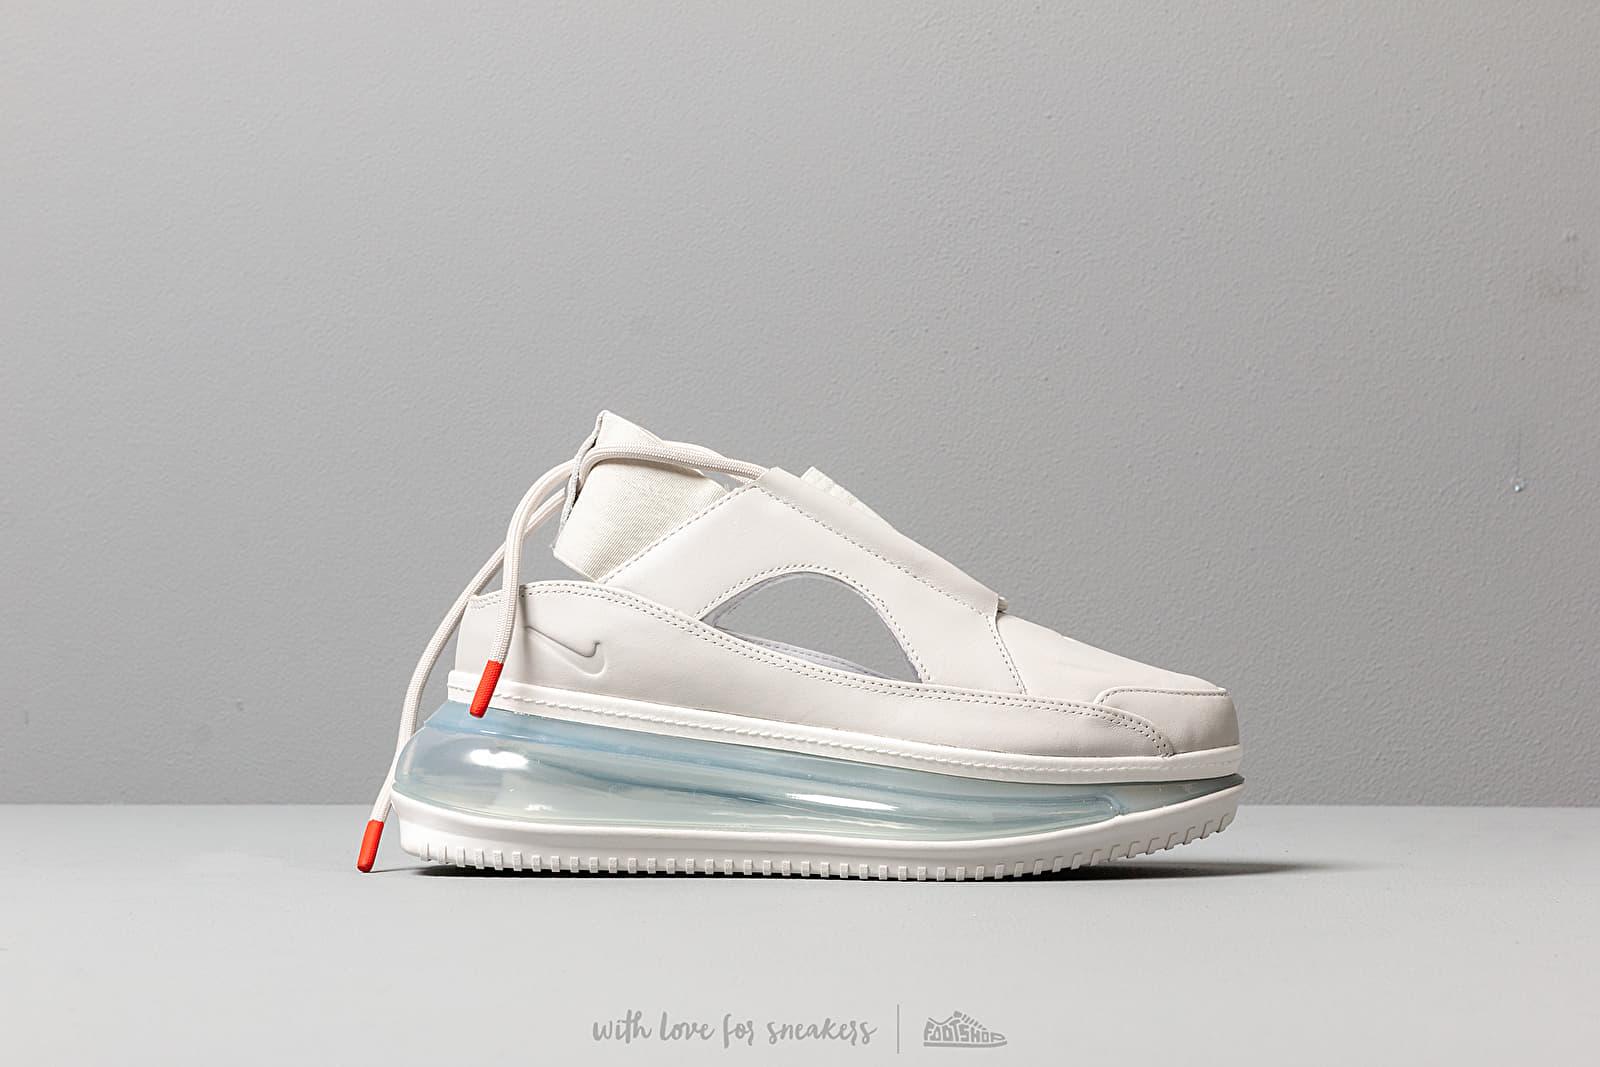 No autorizado Ciudadanía cartucho  Women's shoes Nike W Air Max FF 720 Summit White/ Summit White-Light Bone |  Footshop